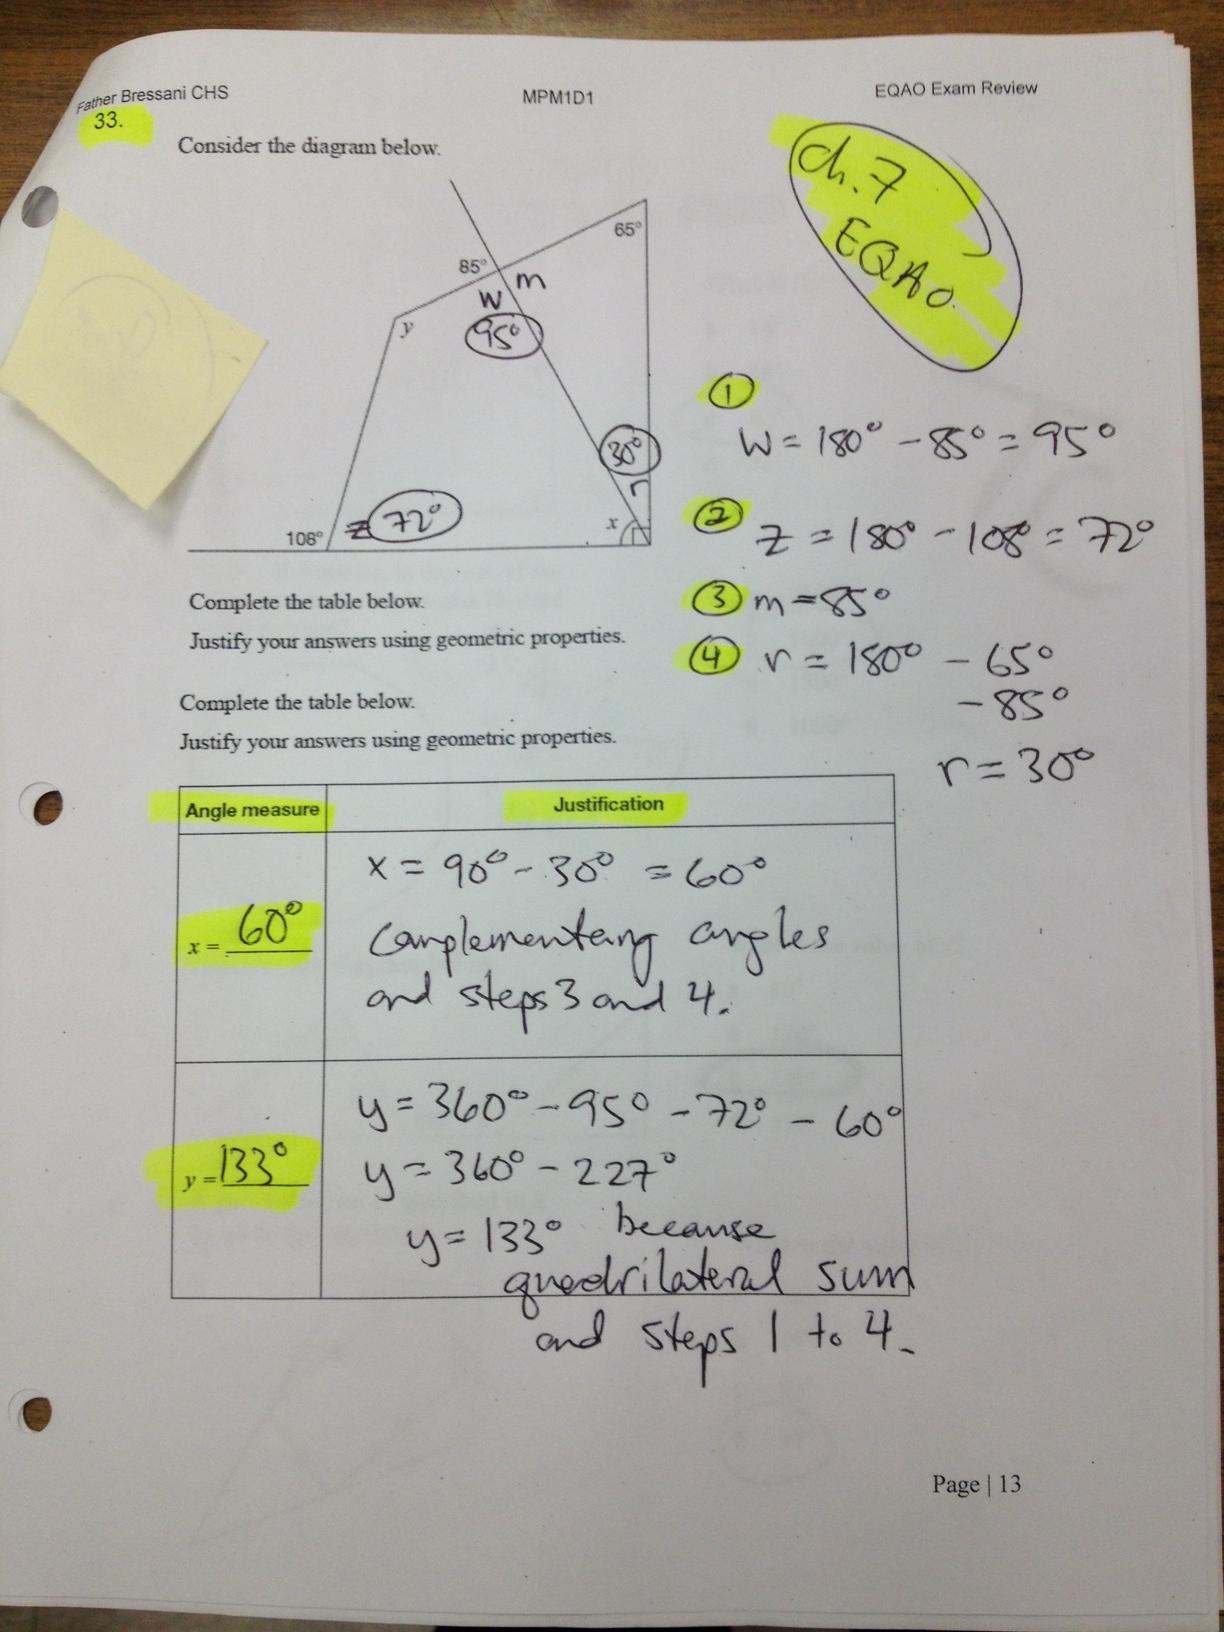 EQAO Preparation April 2012: Resources for Teachers